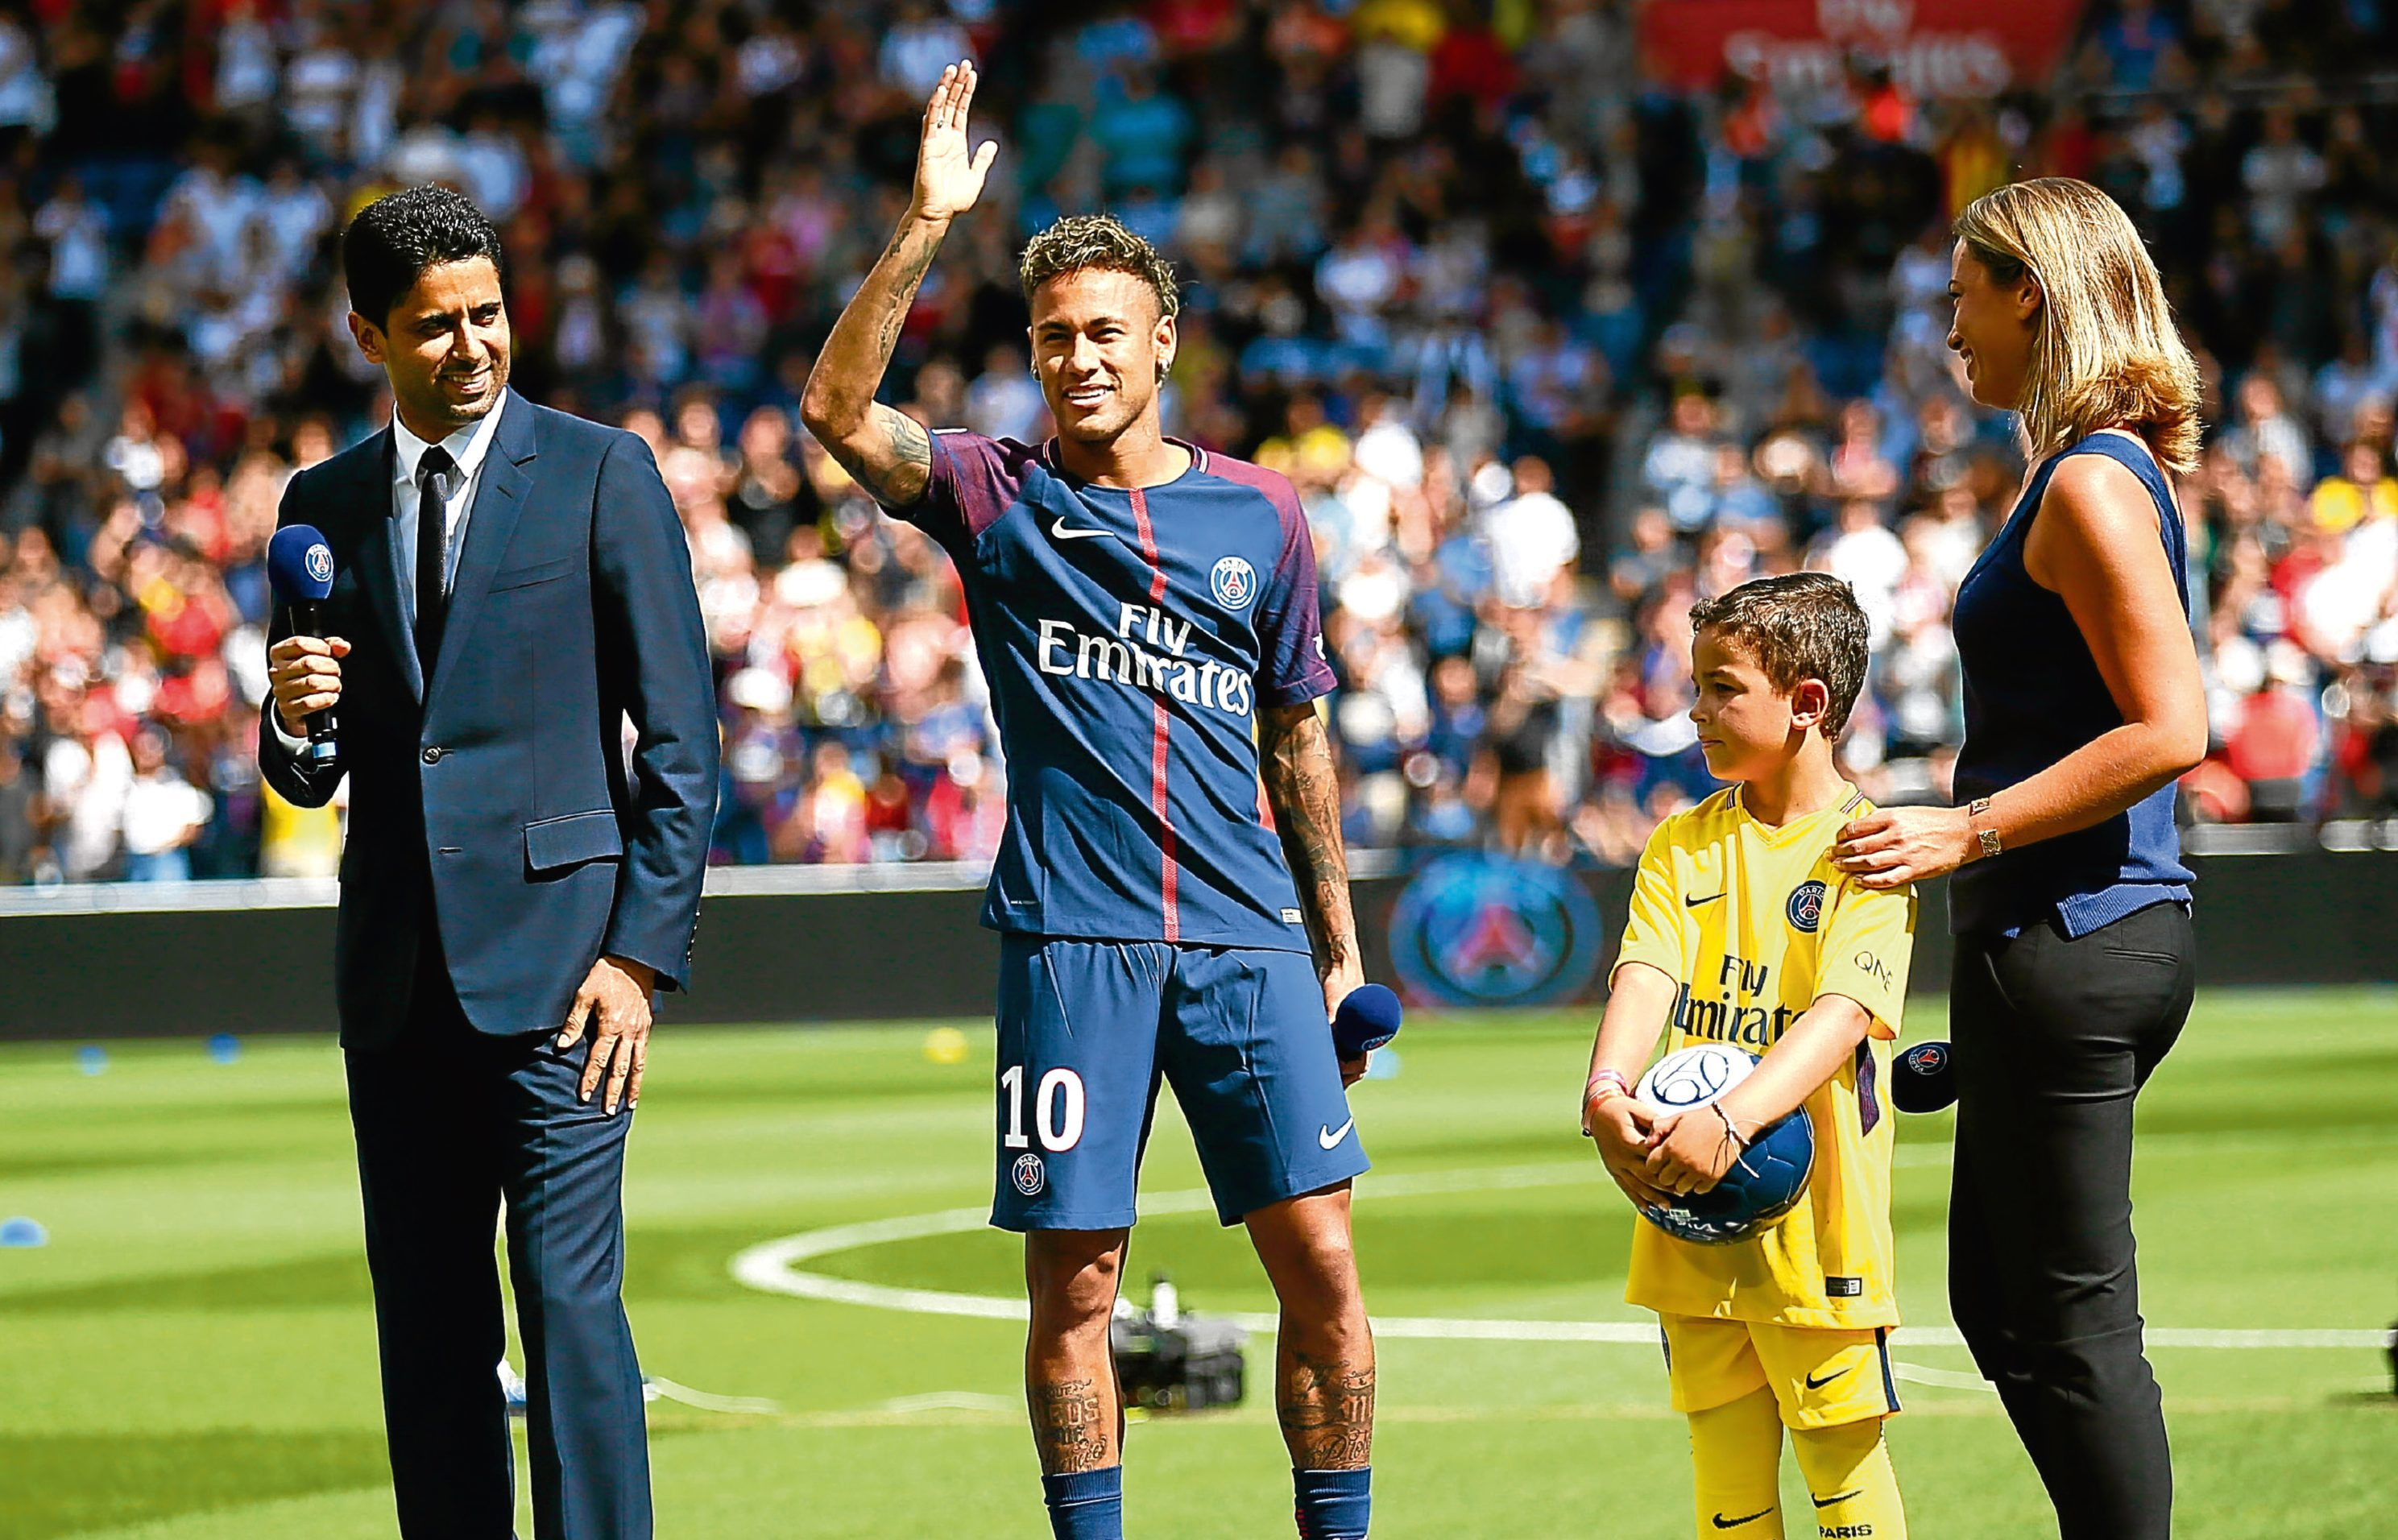 Neymar waves to fans as he stands next to PSG president Nasser Ghanim Al-Khelaïfi at the Parc des Princes (AP Photo/Francois Mori)